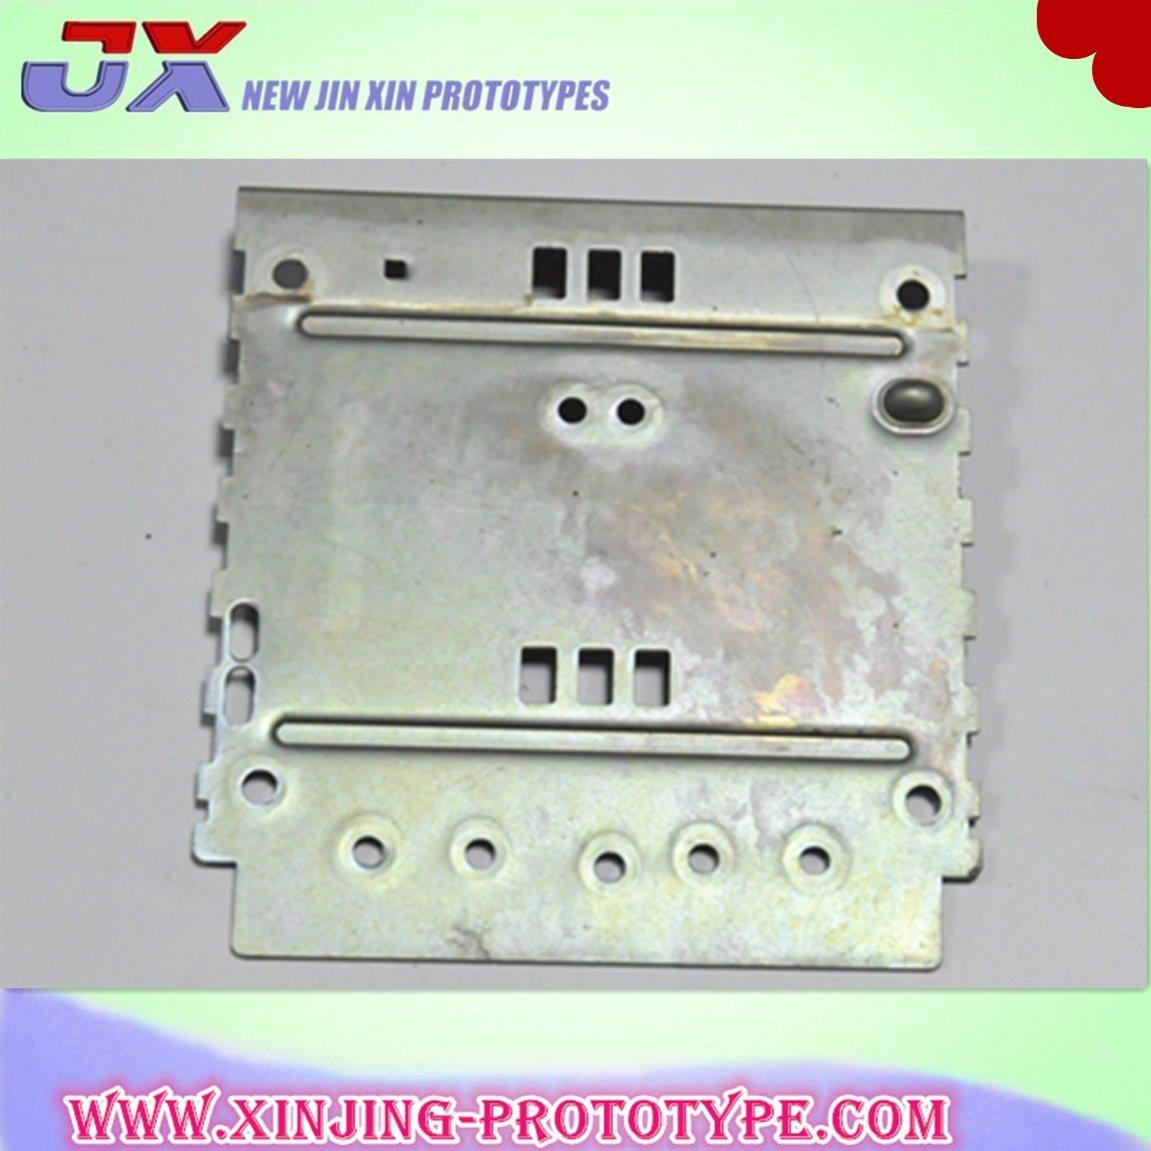 Customized Sheet Metal Fabrication, Aluminum/Stainless Steel/Brass Metal Stamping